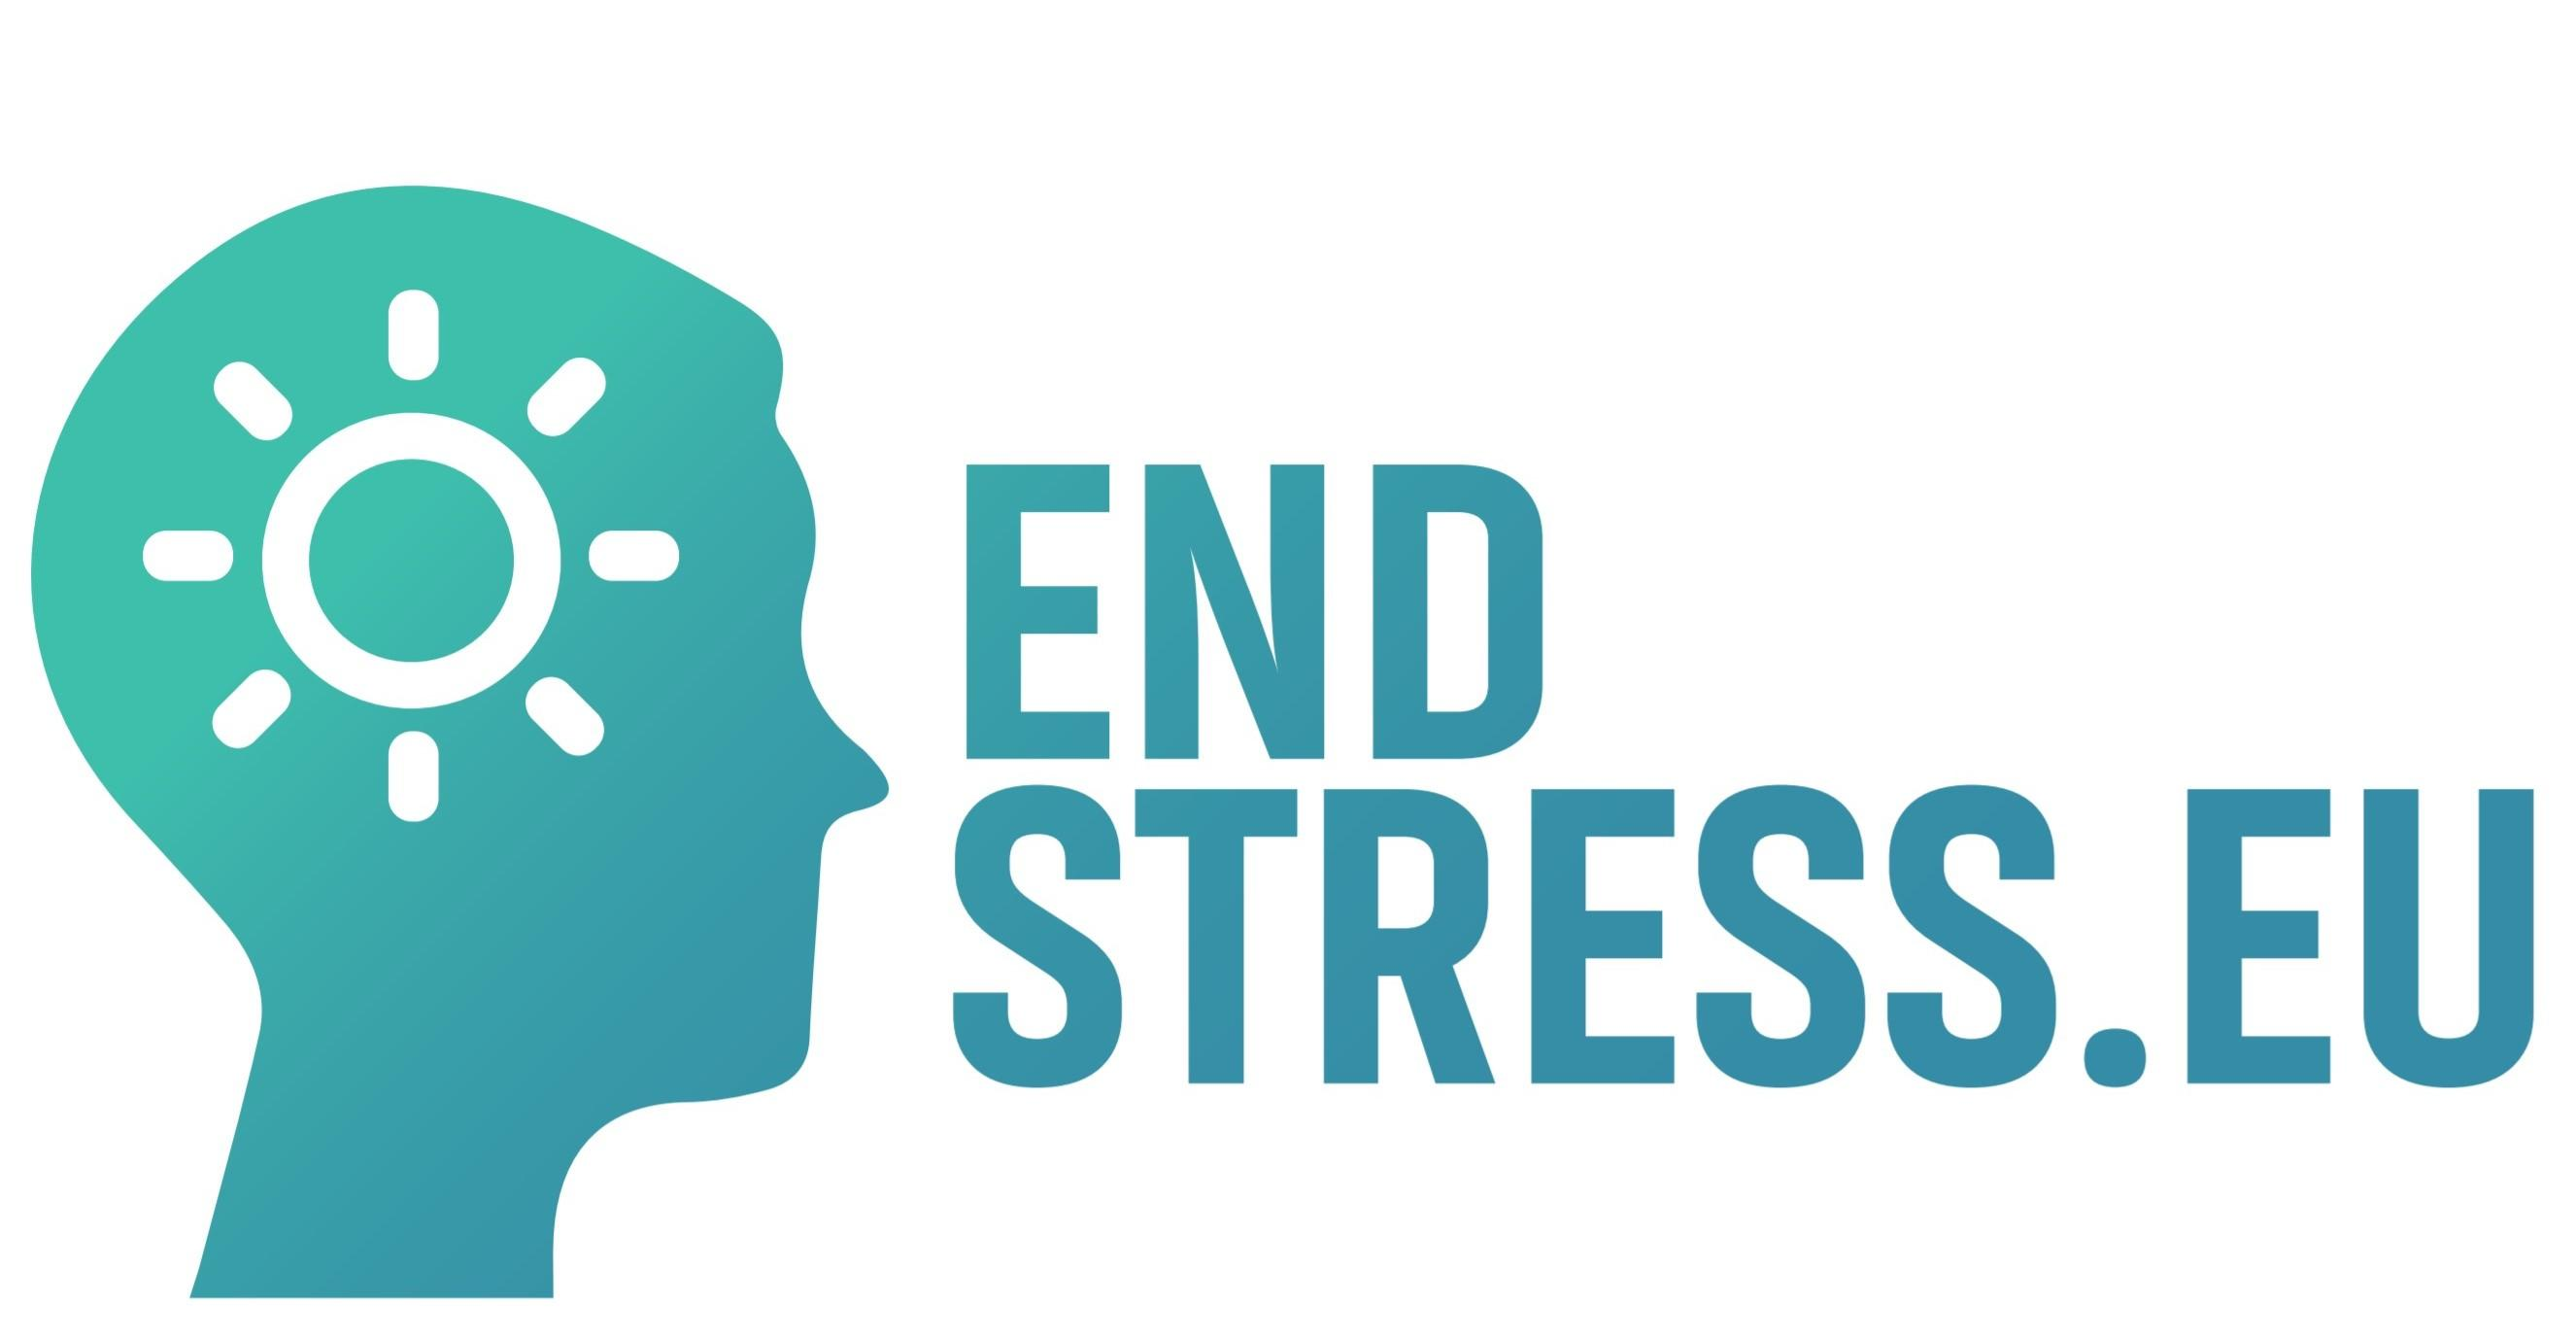 Endstress.eu. Photo: ETUC / Eurocadres